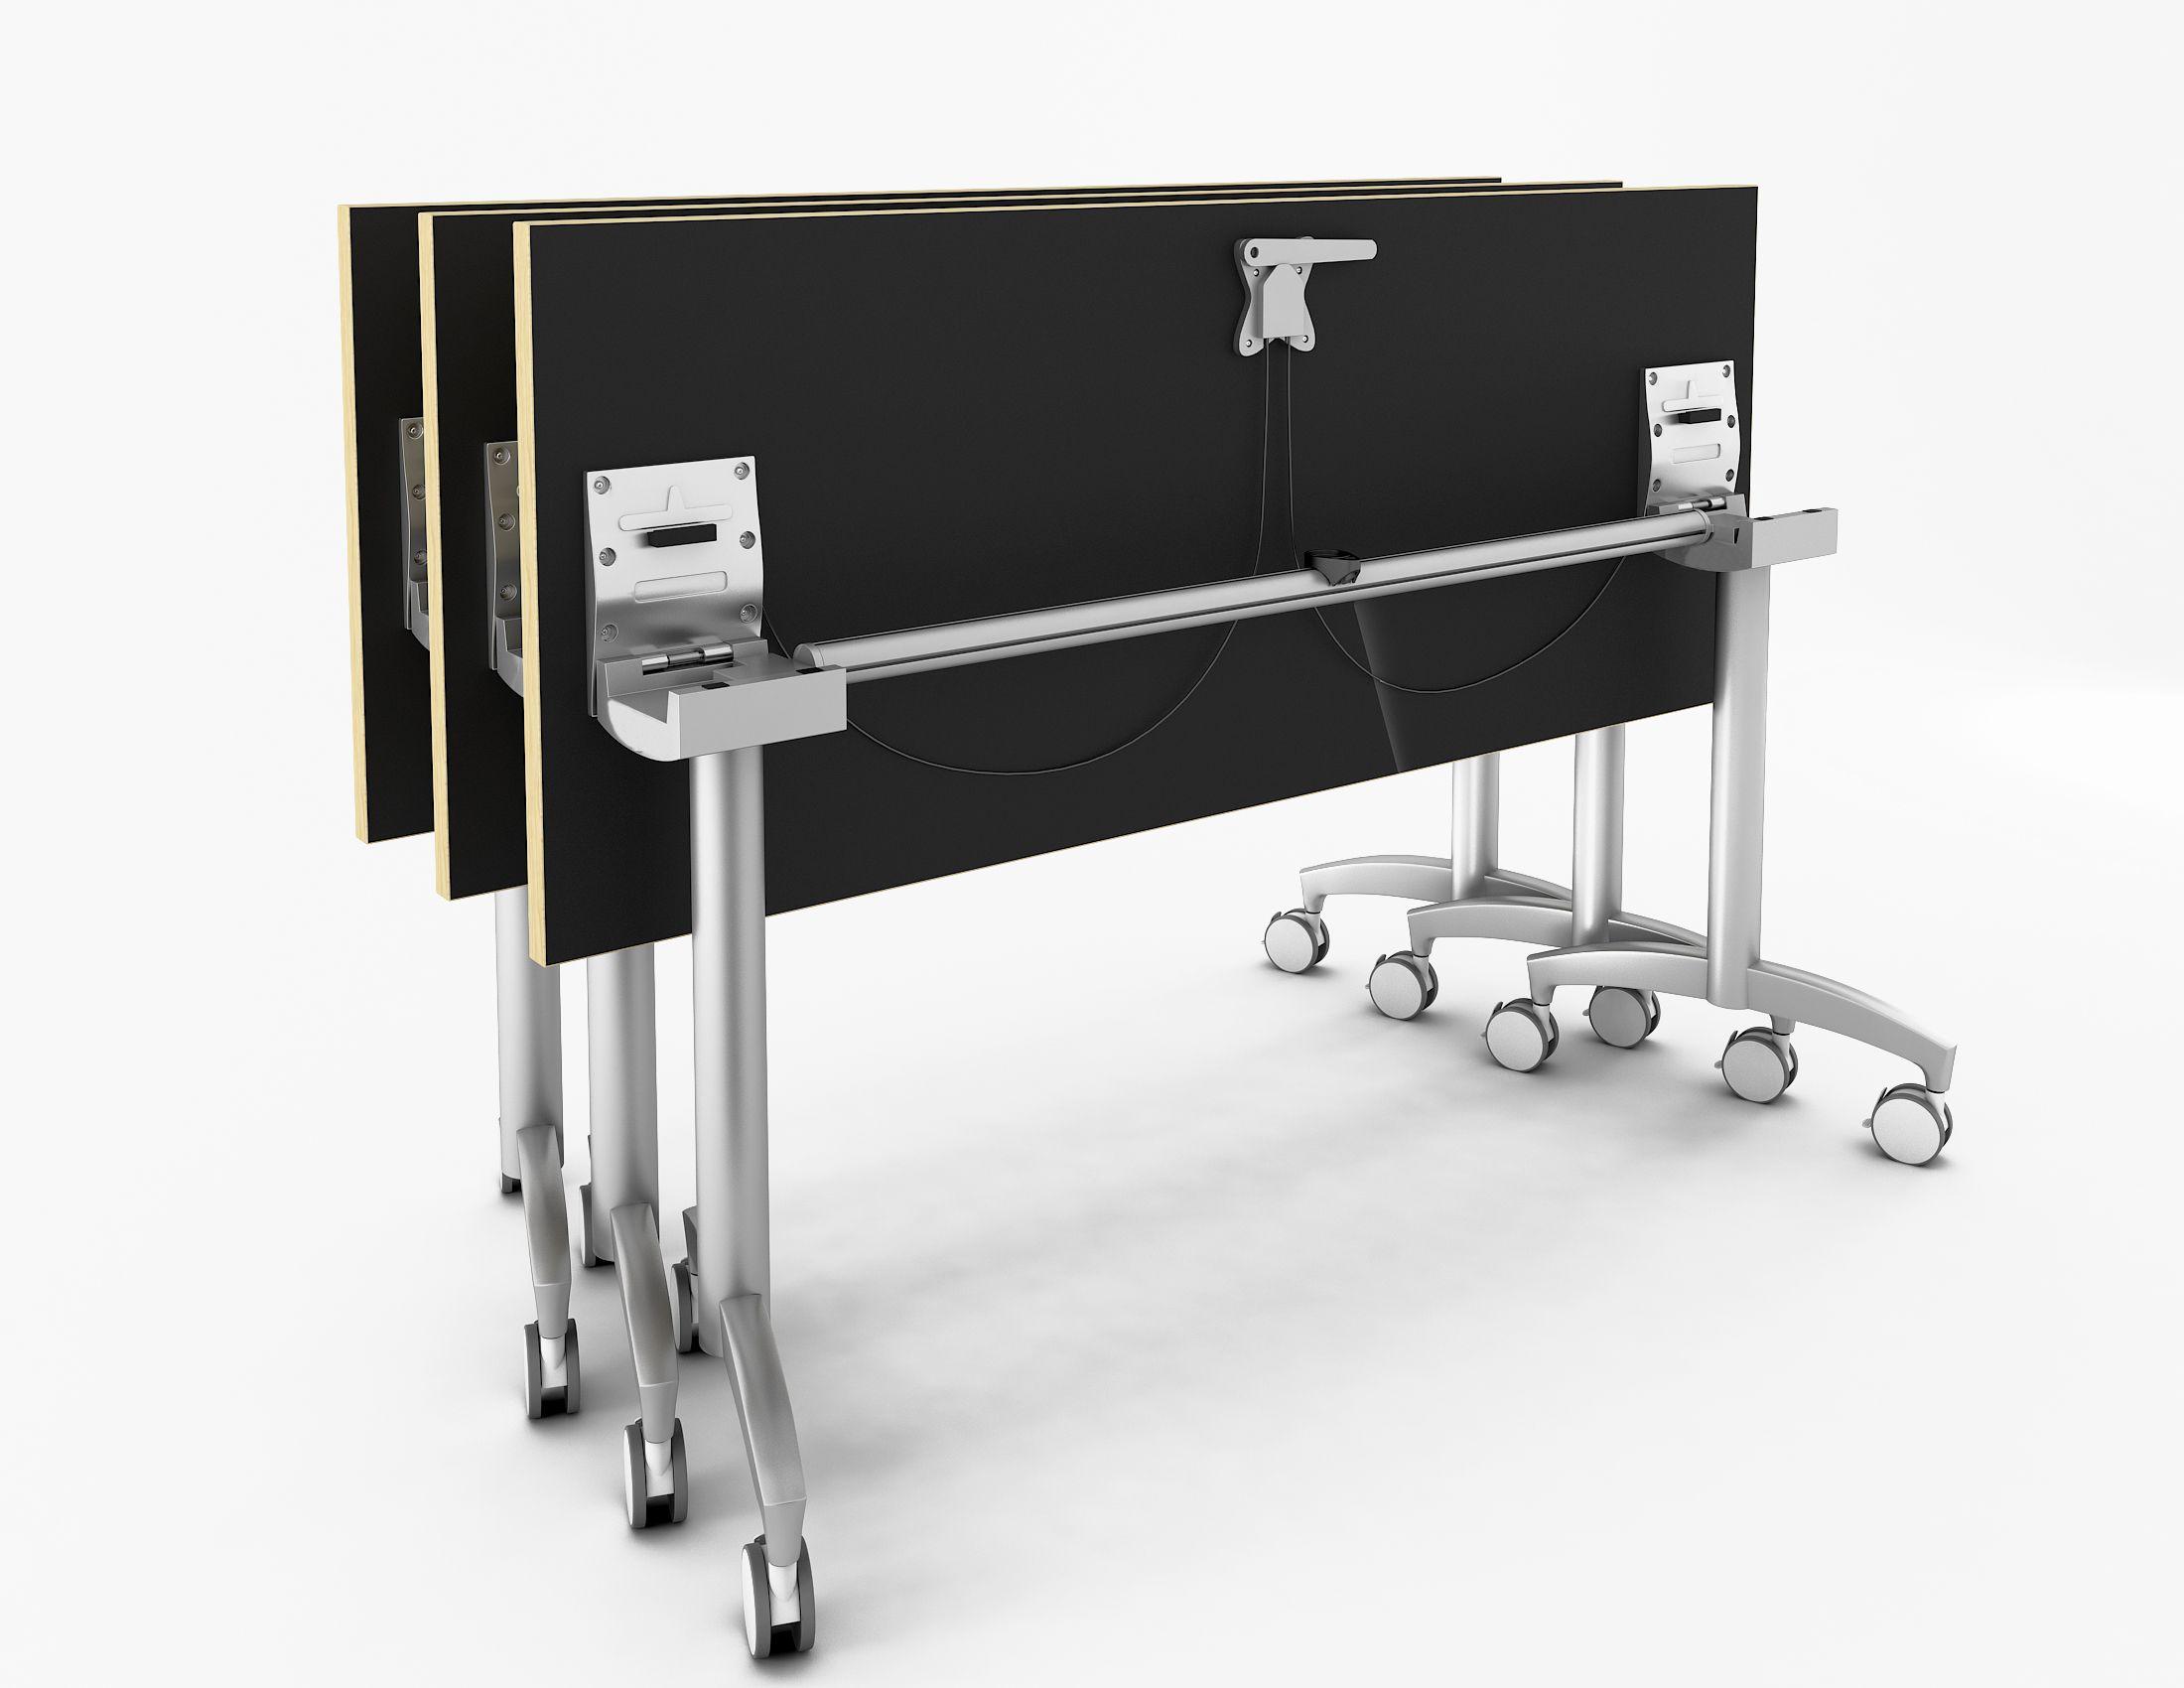 Enwork Sensation Flip Tables With Angled Legs Nested